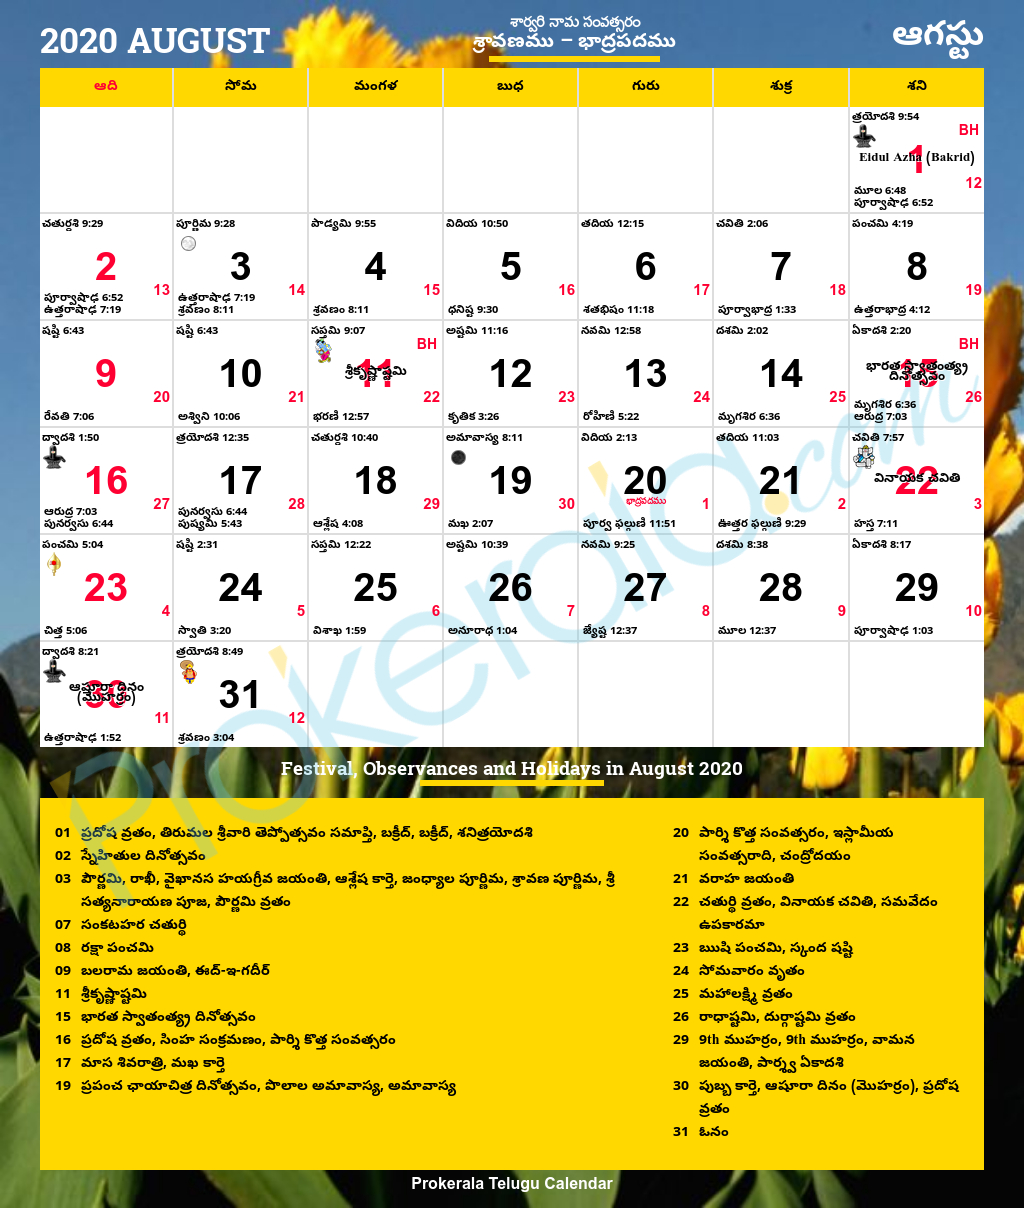 Telugu Calendar 2020, August intended for 1993 Kannada Calendar